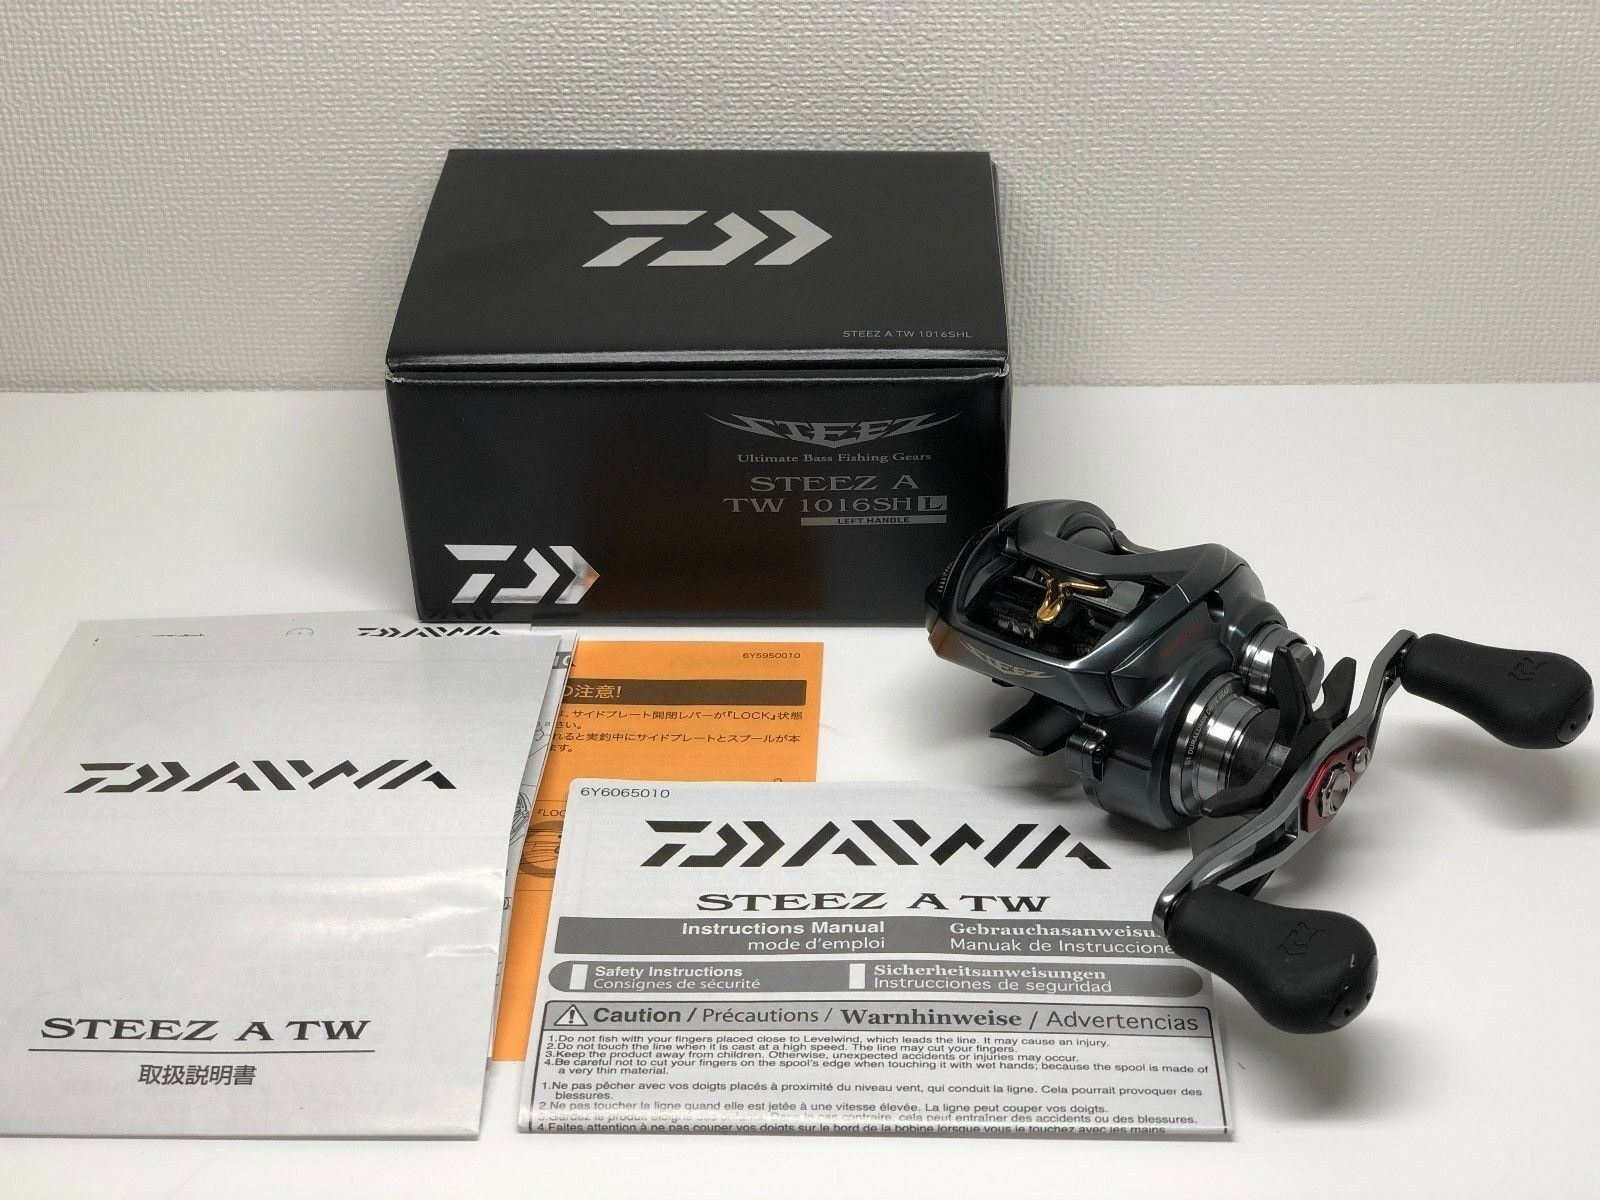 DAIWA 17 STEEZ A TW 1016SHL   - Free Shipping from Japan